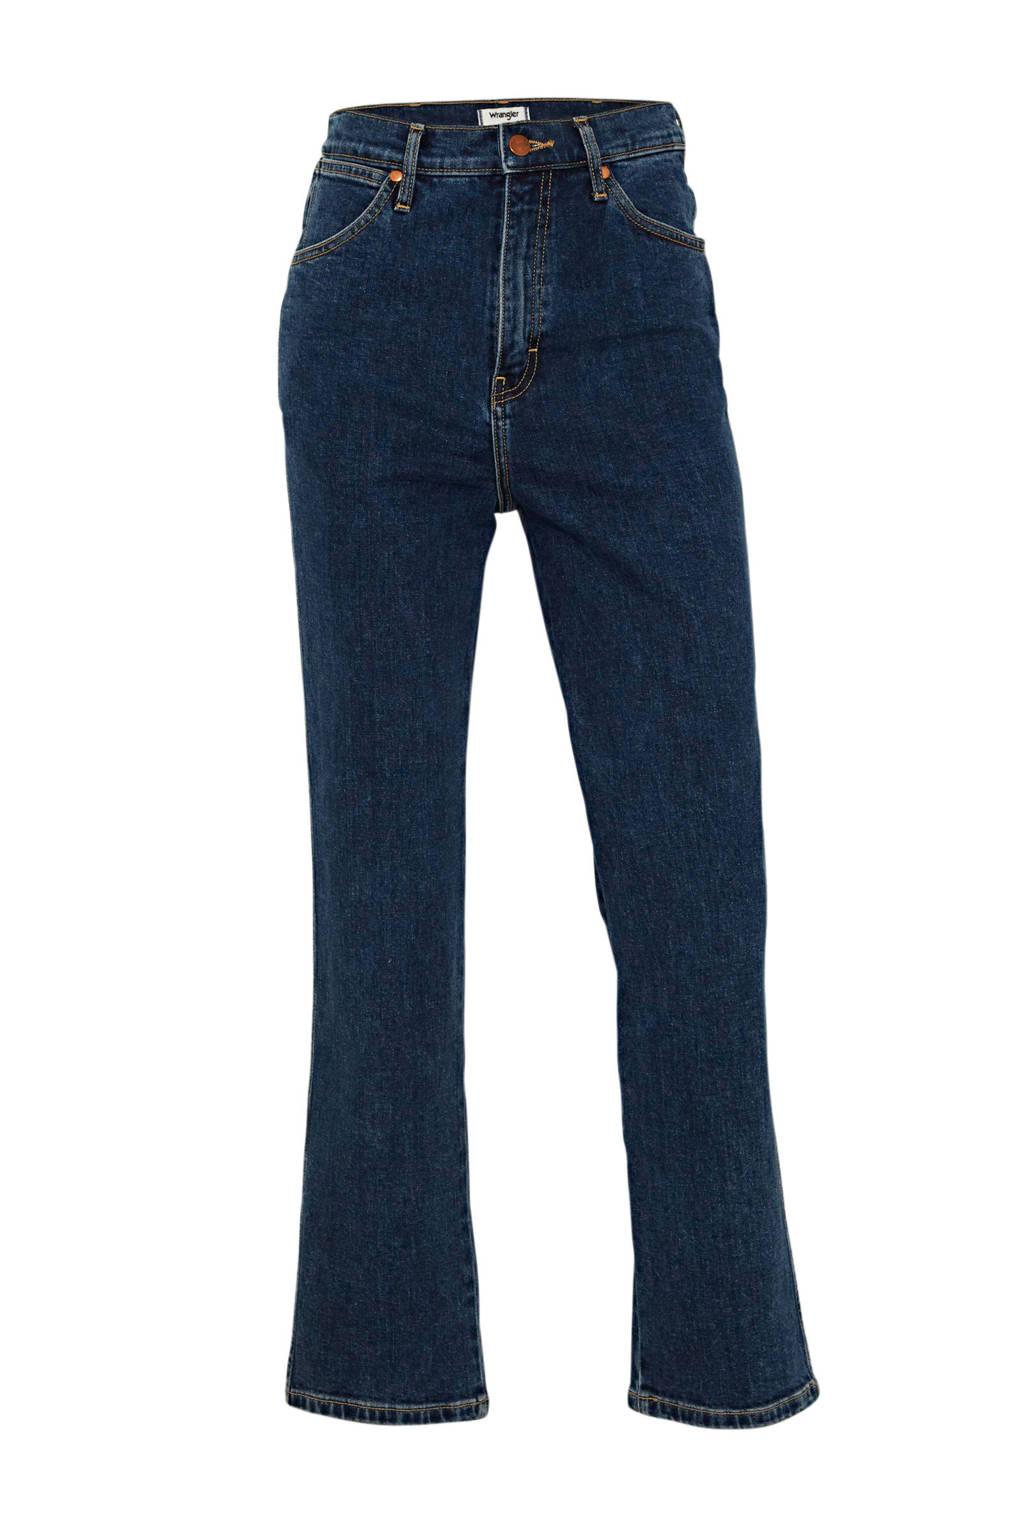 Wrangler high waist straight fit jeans dark denim, Dark denim